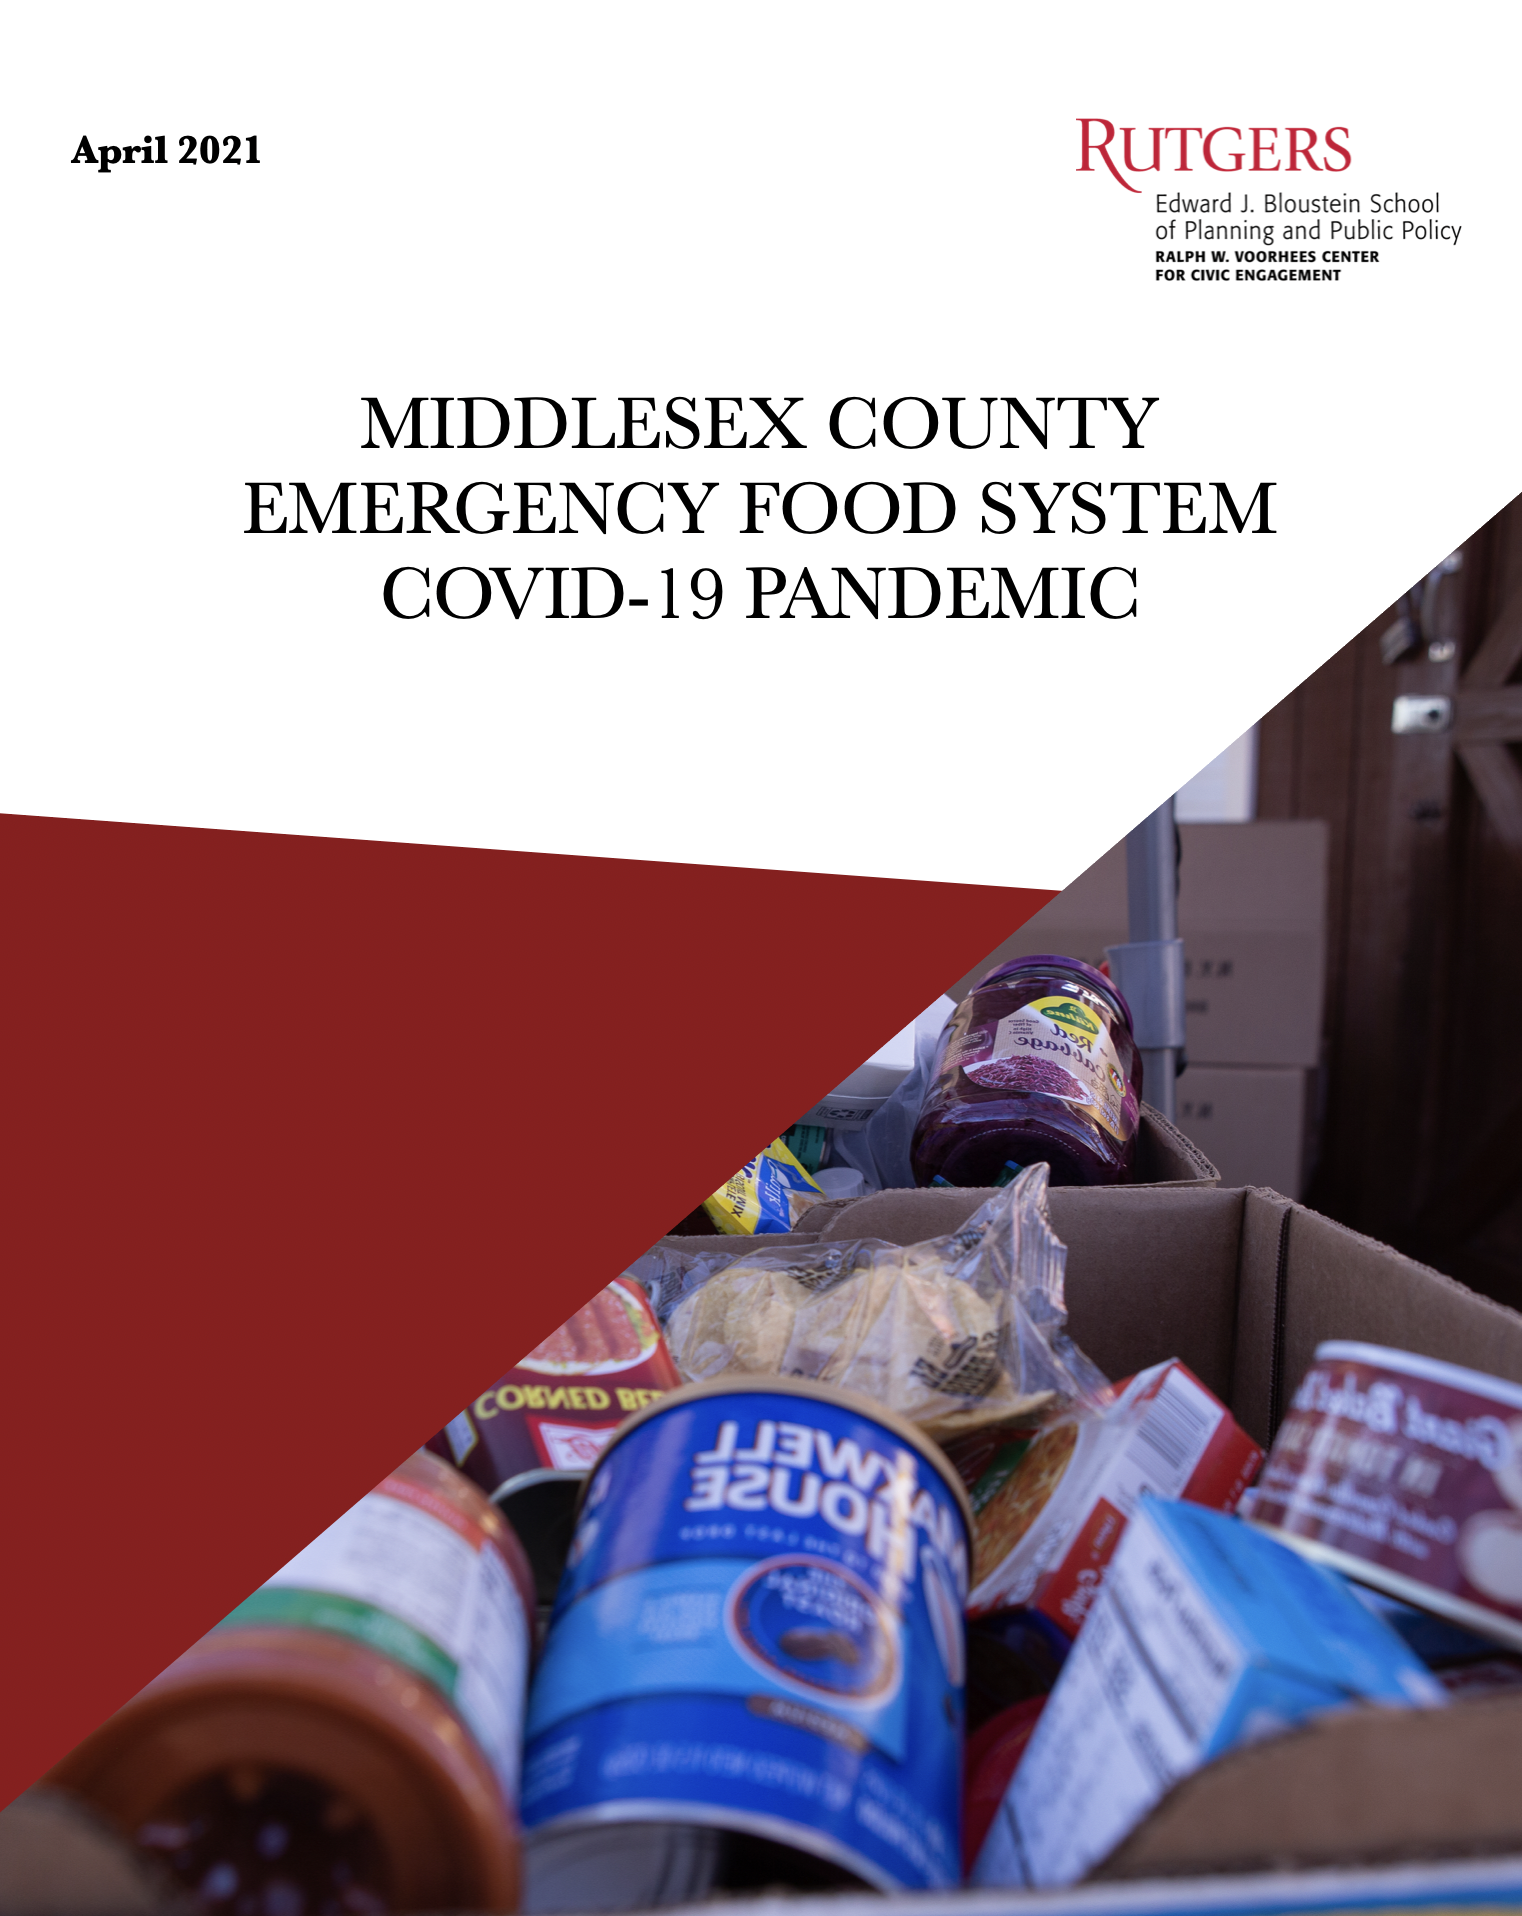 food pantry covid pandemic Rutgers university